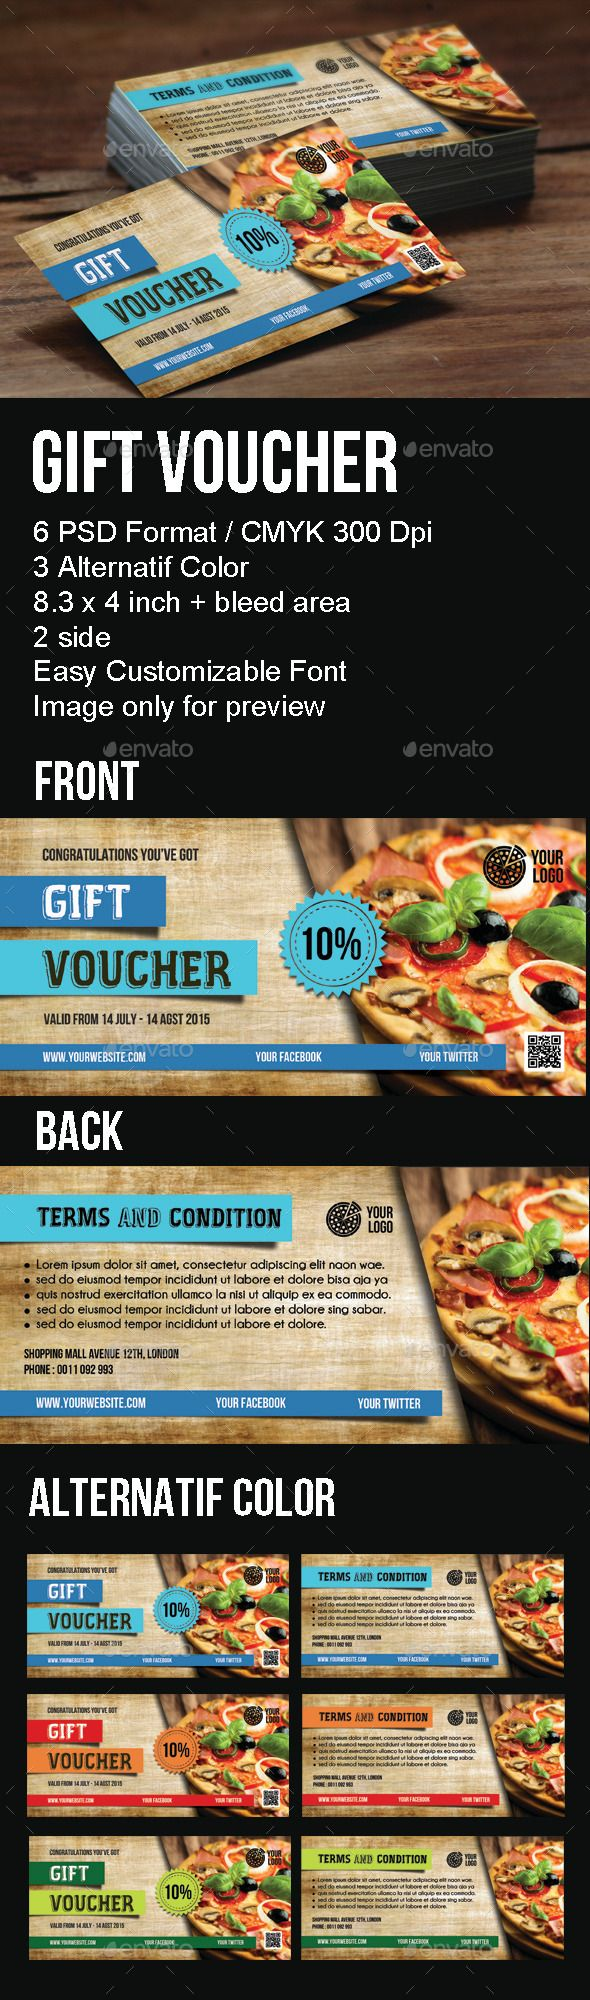 Gift Voucher Template #design Download: http://graphicriver.net/item/gift-voucher/12404702?ref=ksioks